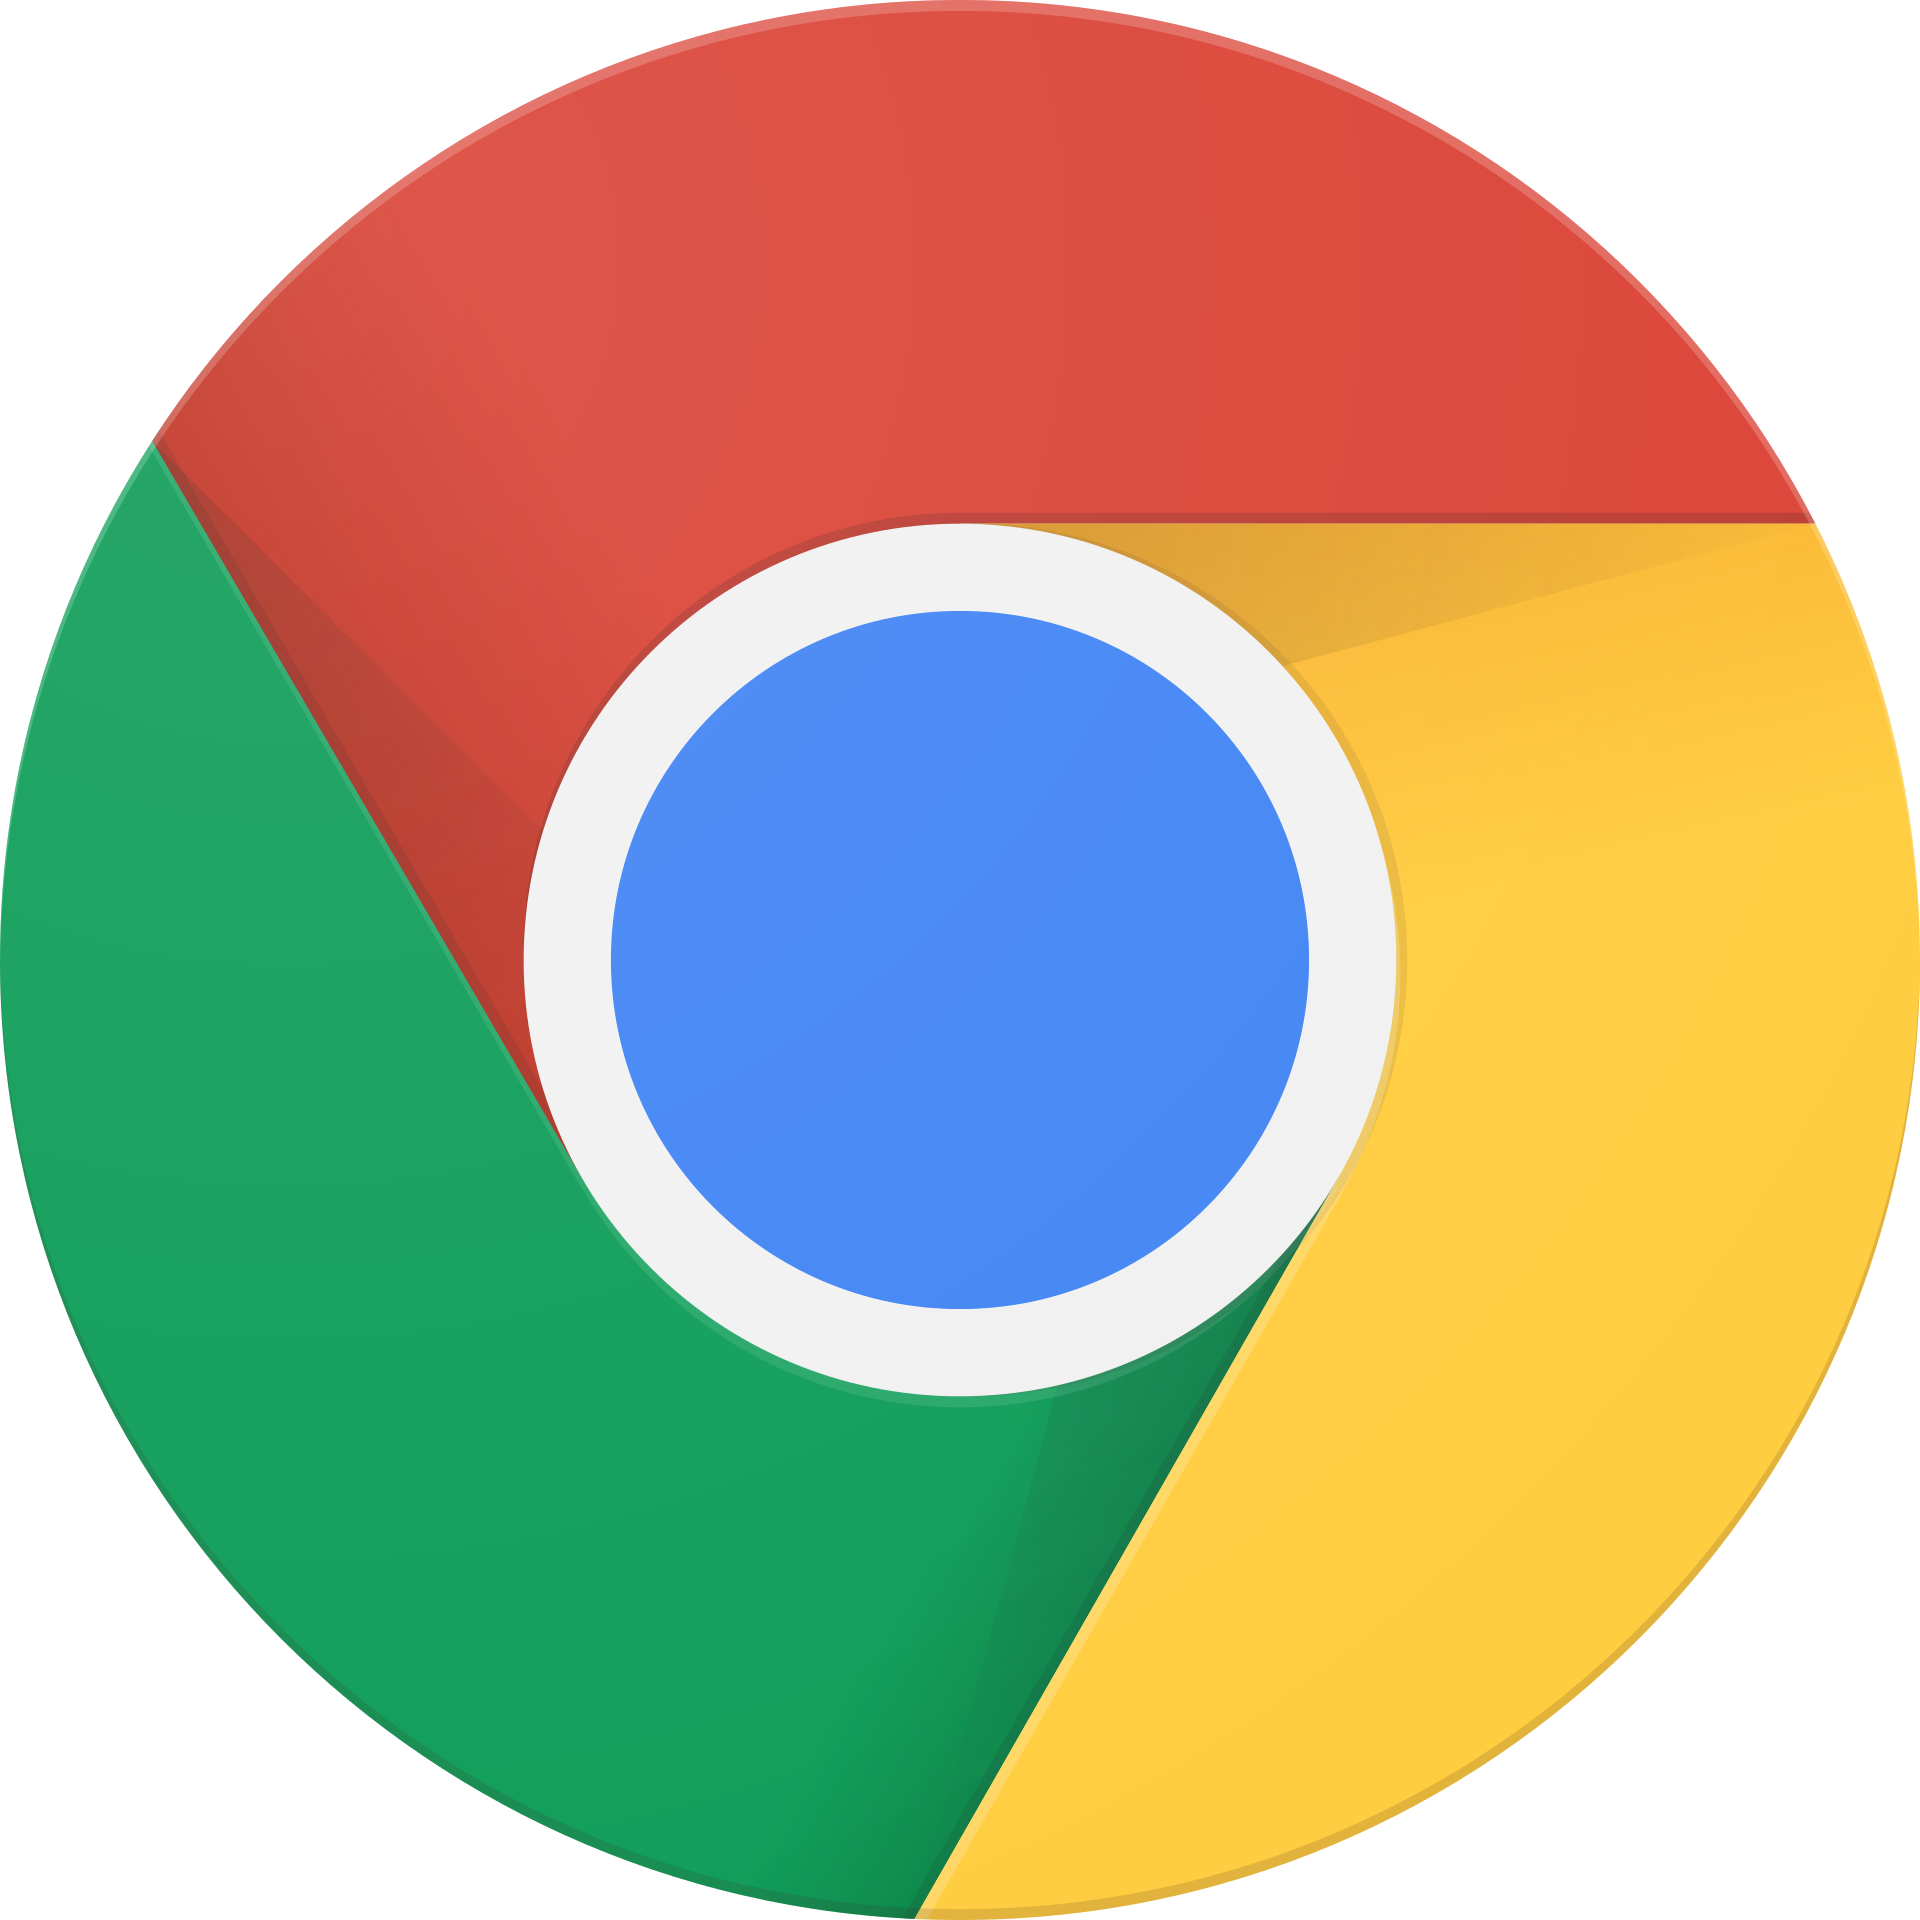 File:GooglechromeLogo.png